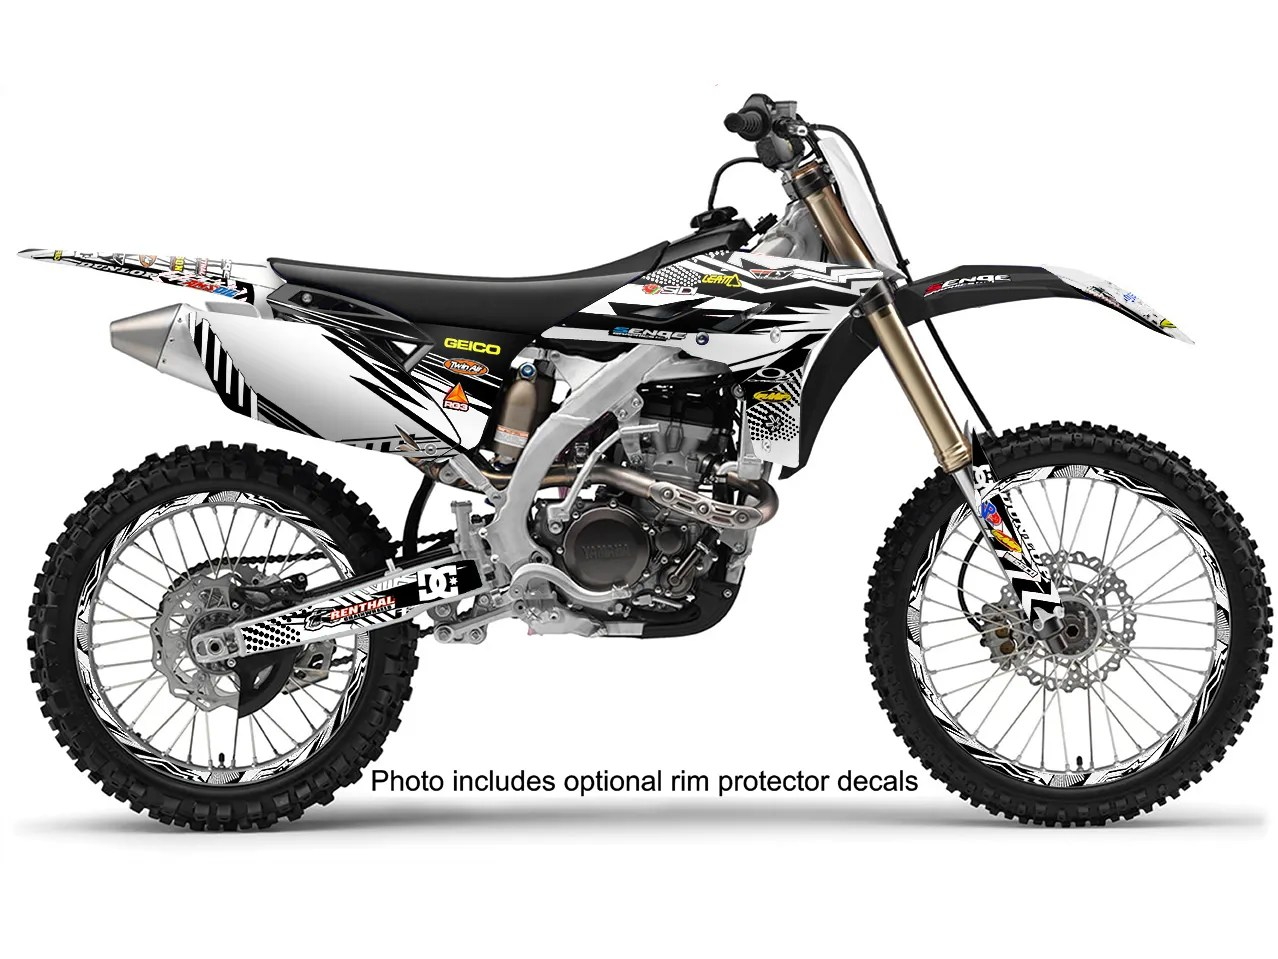 Wr 250 450 Graphics Kit Yamaha Wr250f Wr450f